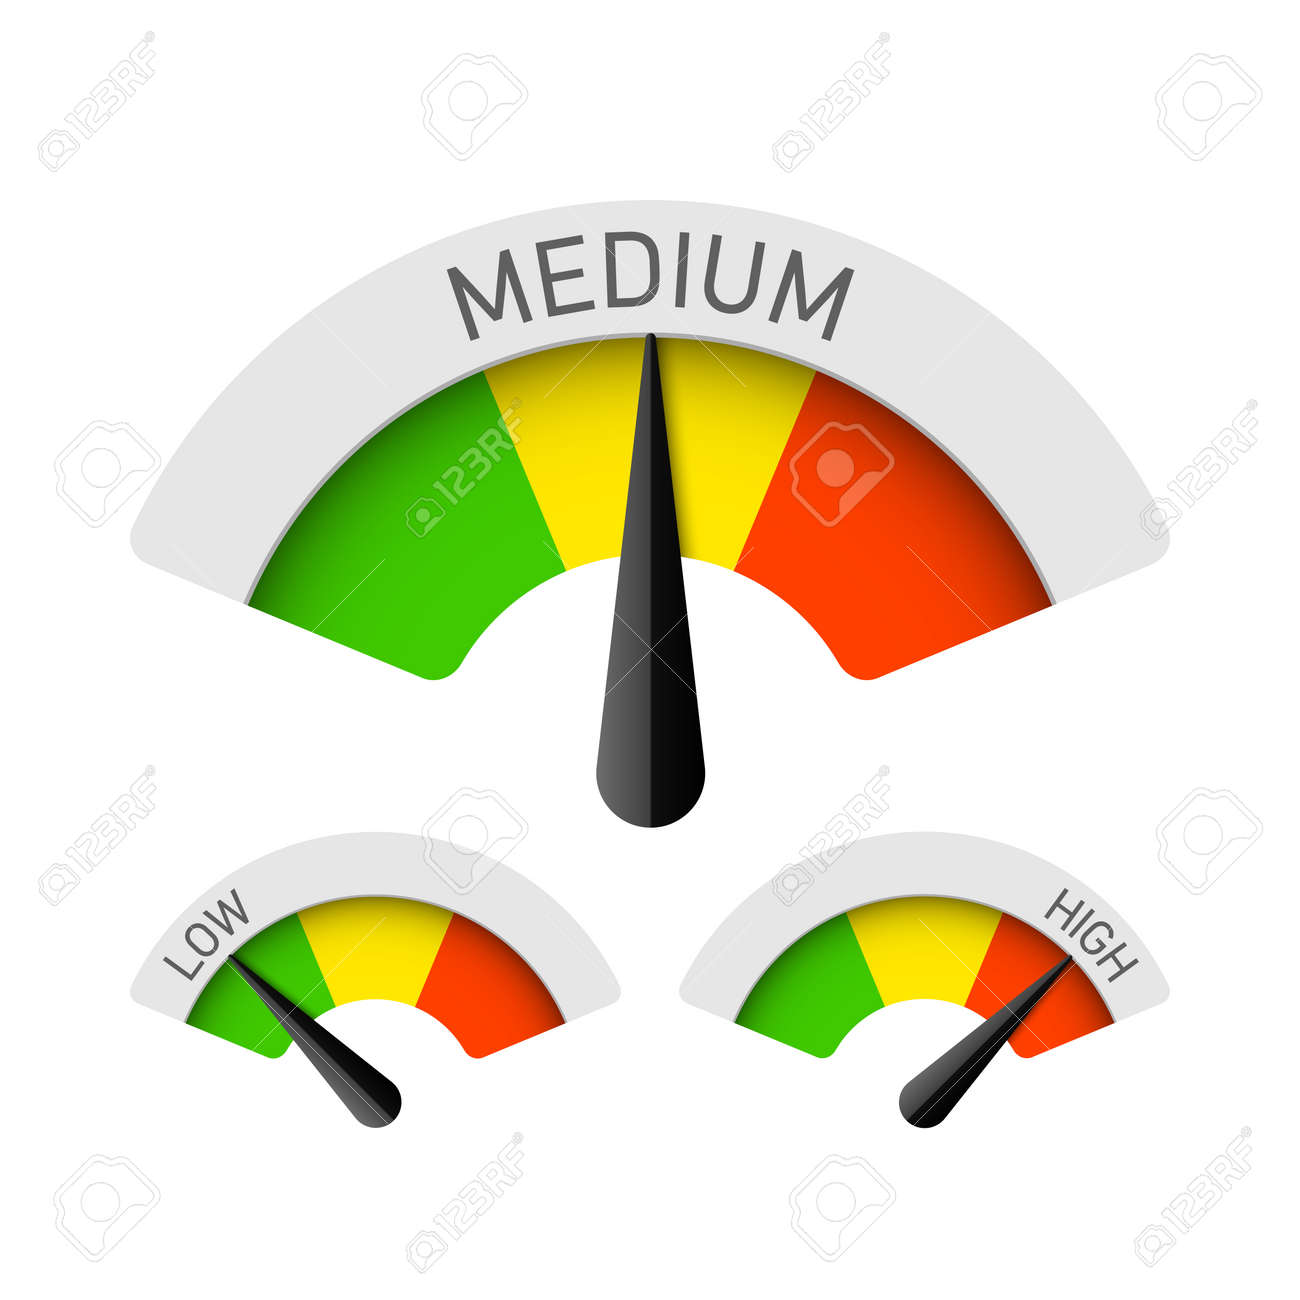 Low, Medium and High gauges - 66991775